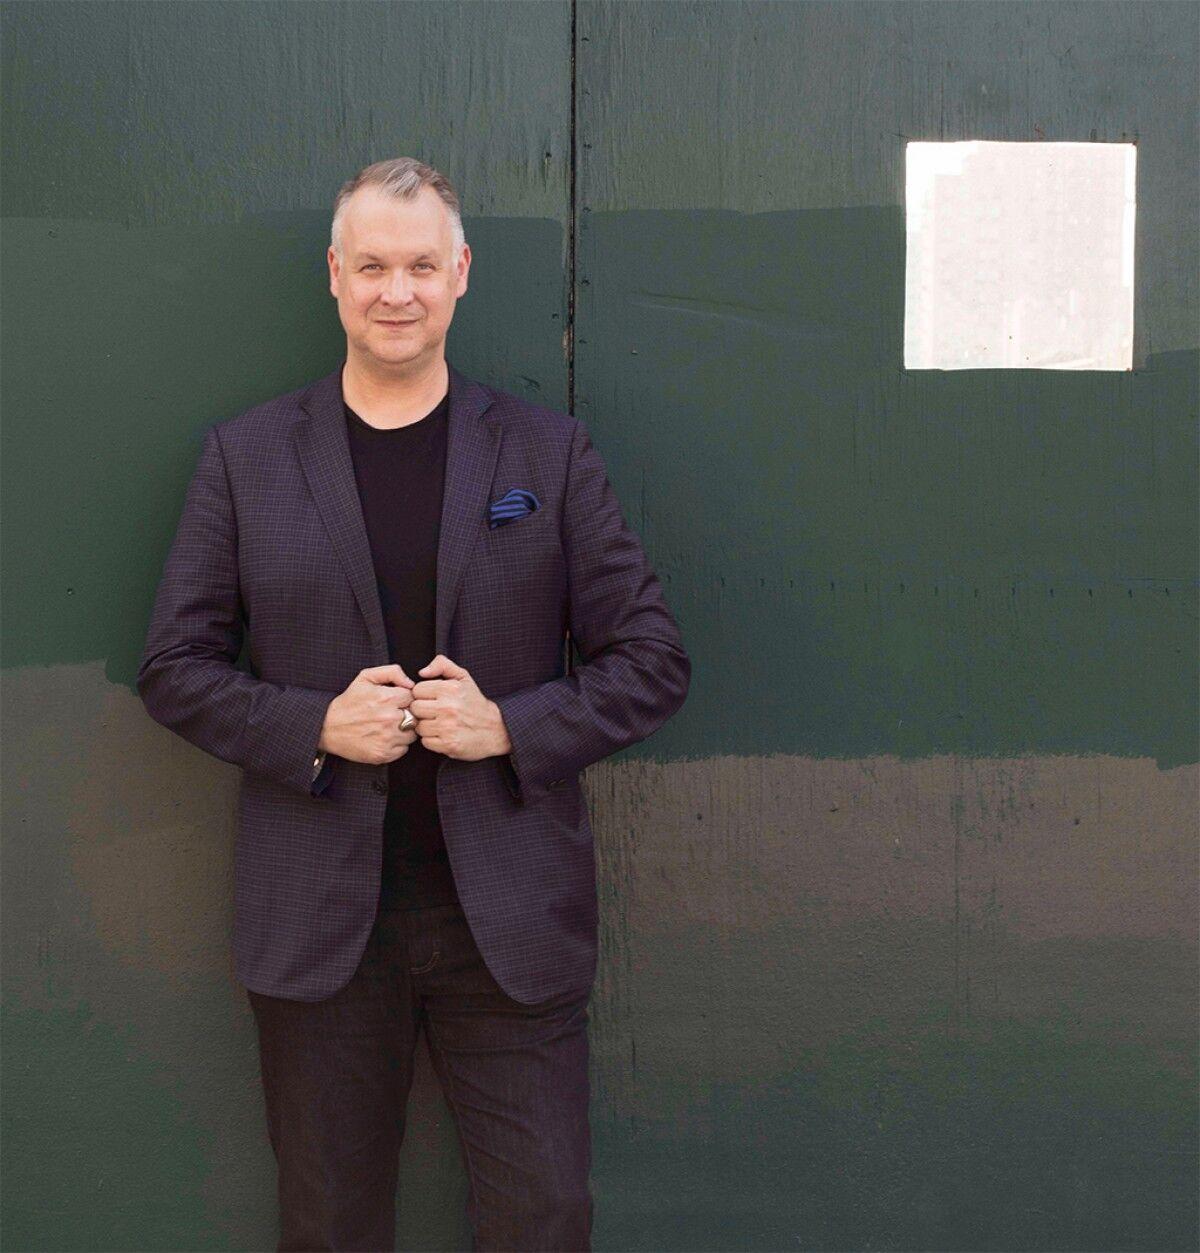 Portrait of Eric Shiner. Photo by Walker Olesen. Courtesy of White Cube.